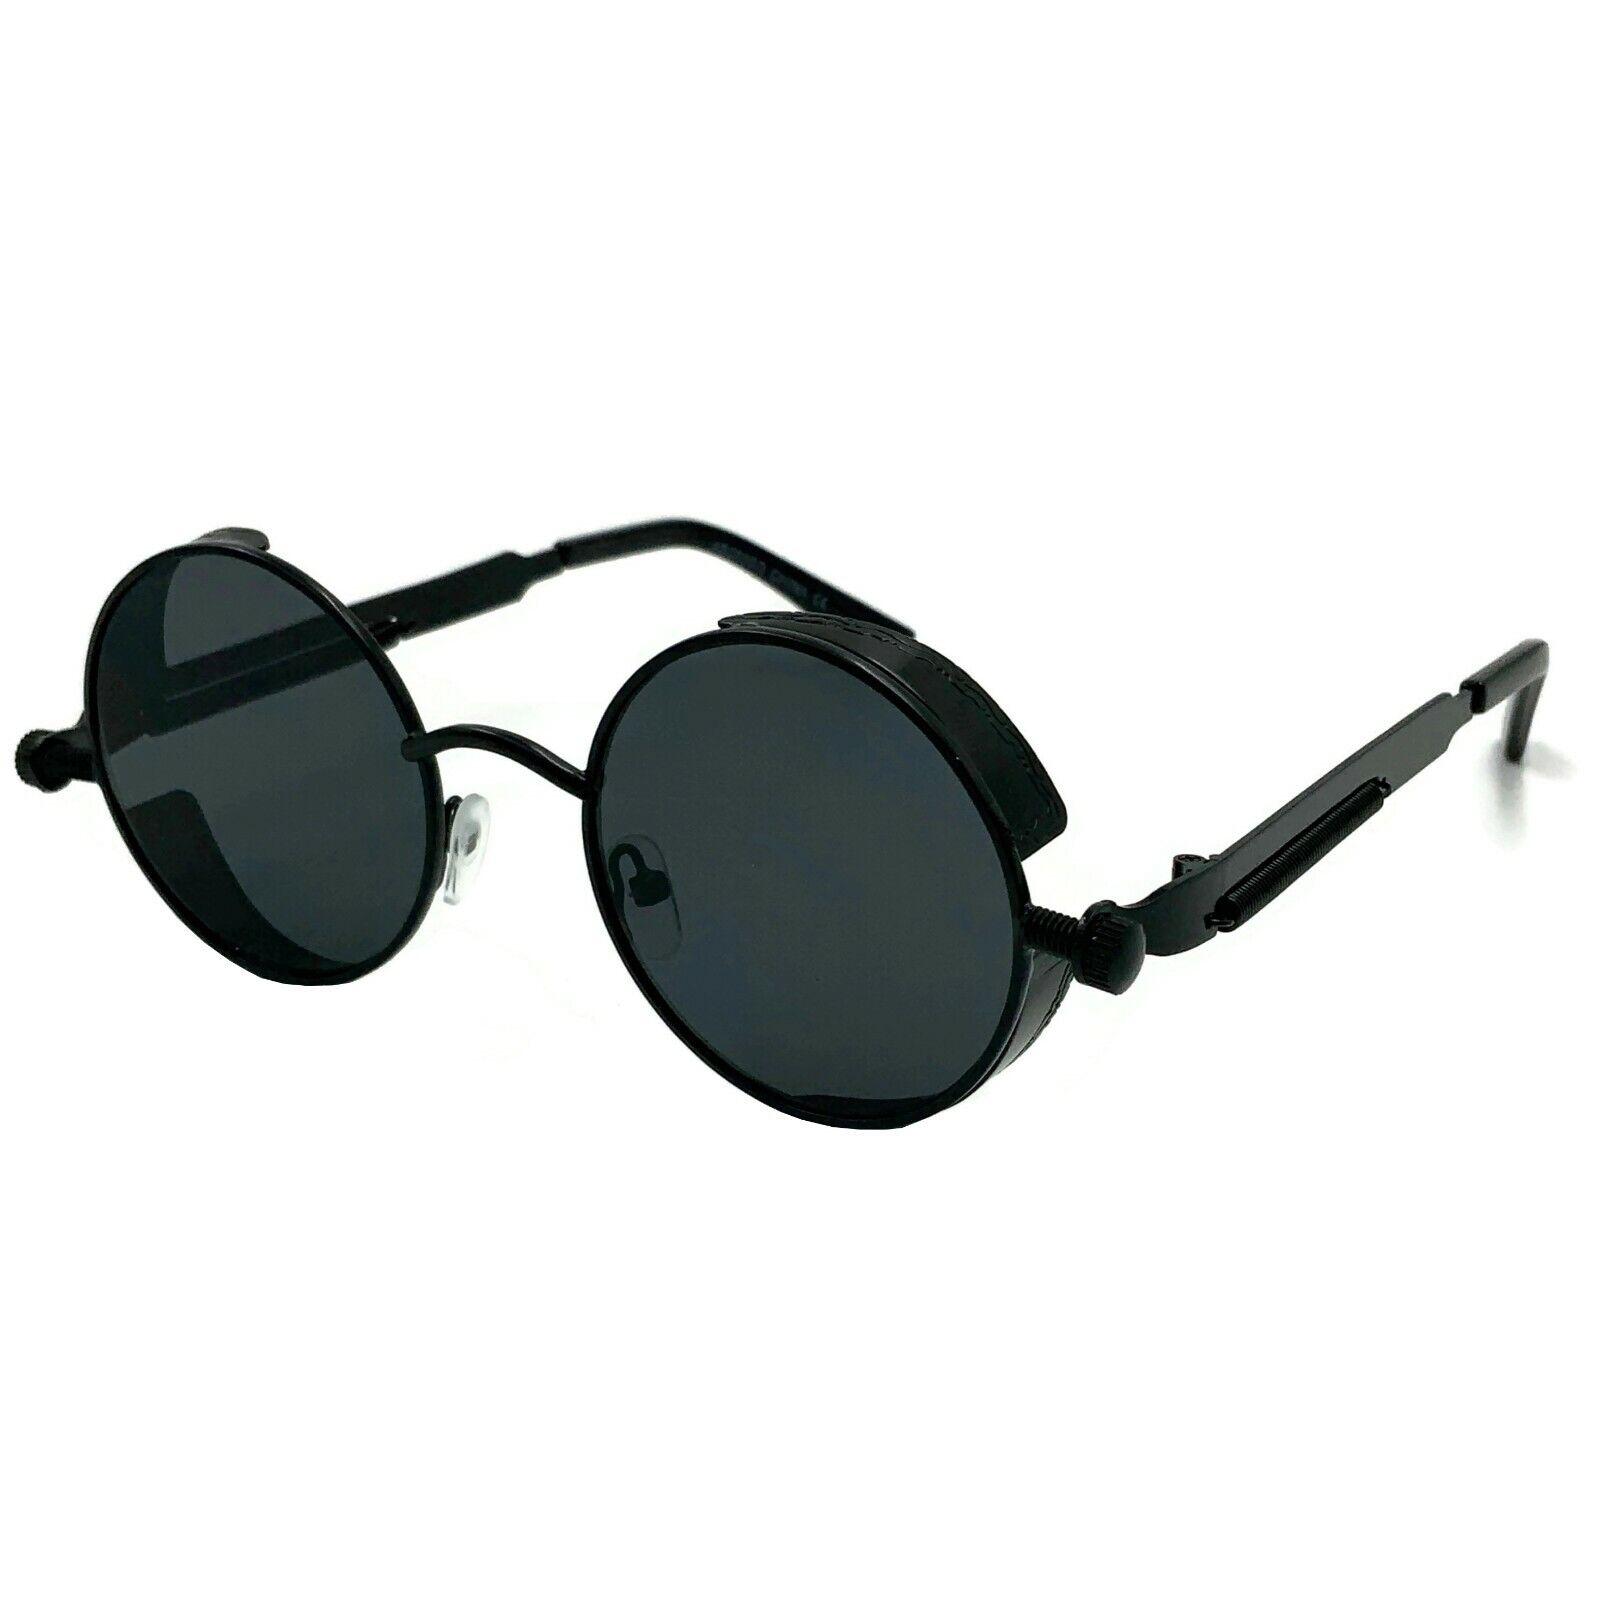 Round Metal Sunglasses Steampunk Men Women Fashion Glasses Brand Designer Retro